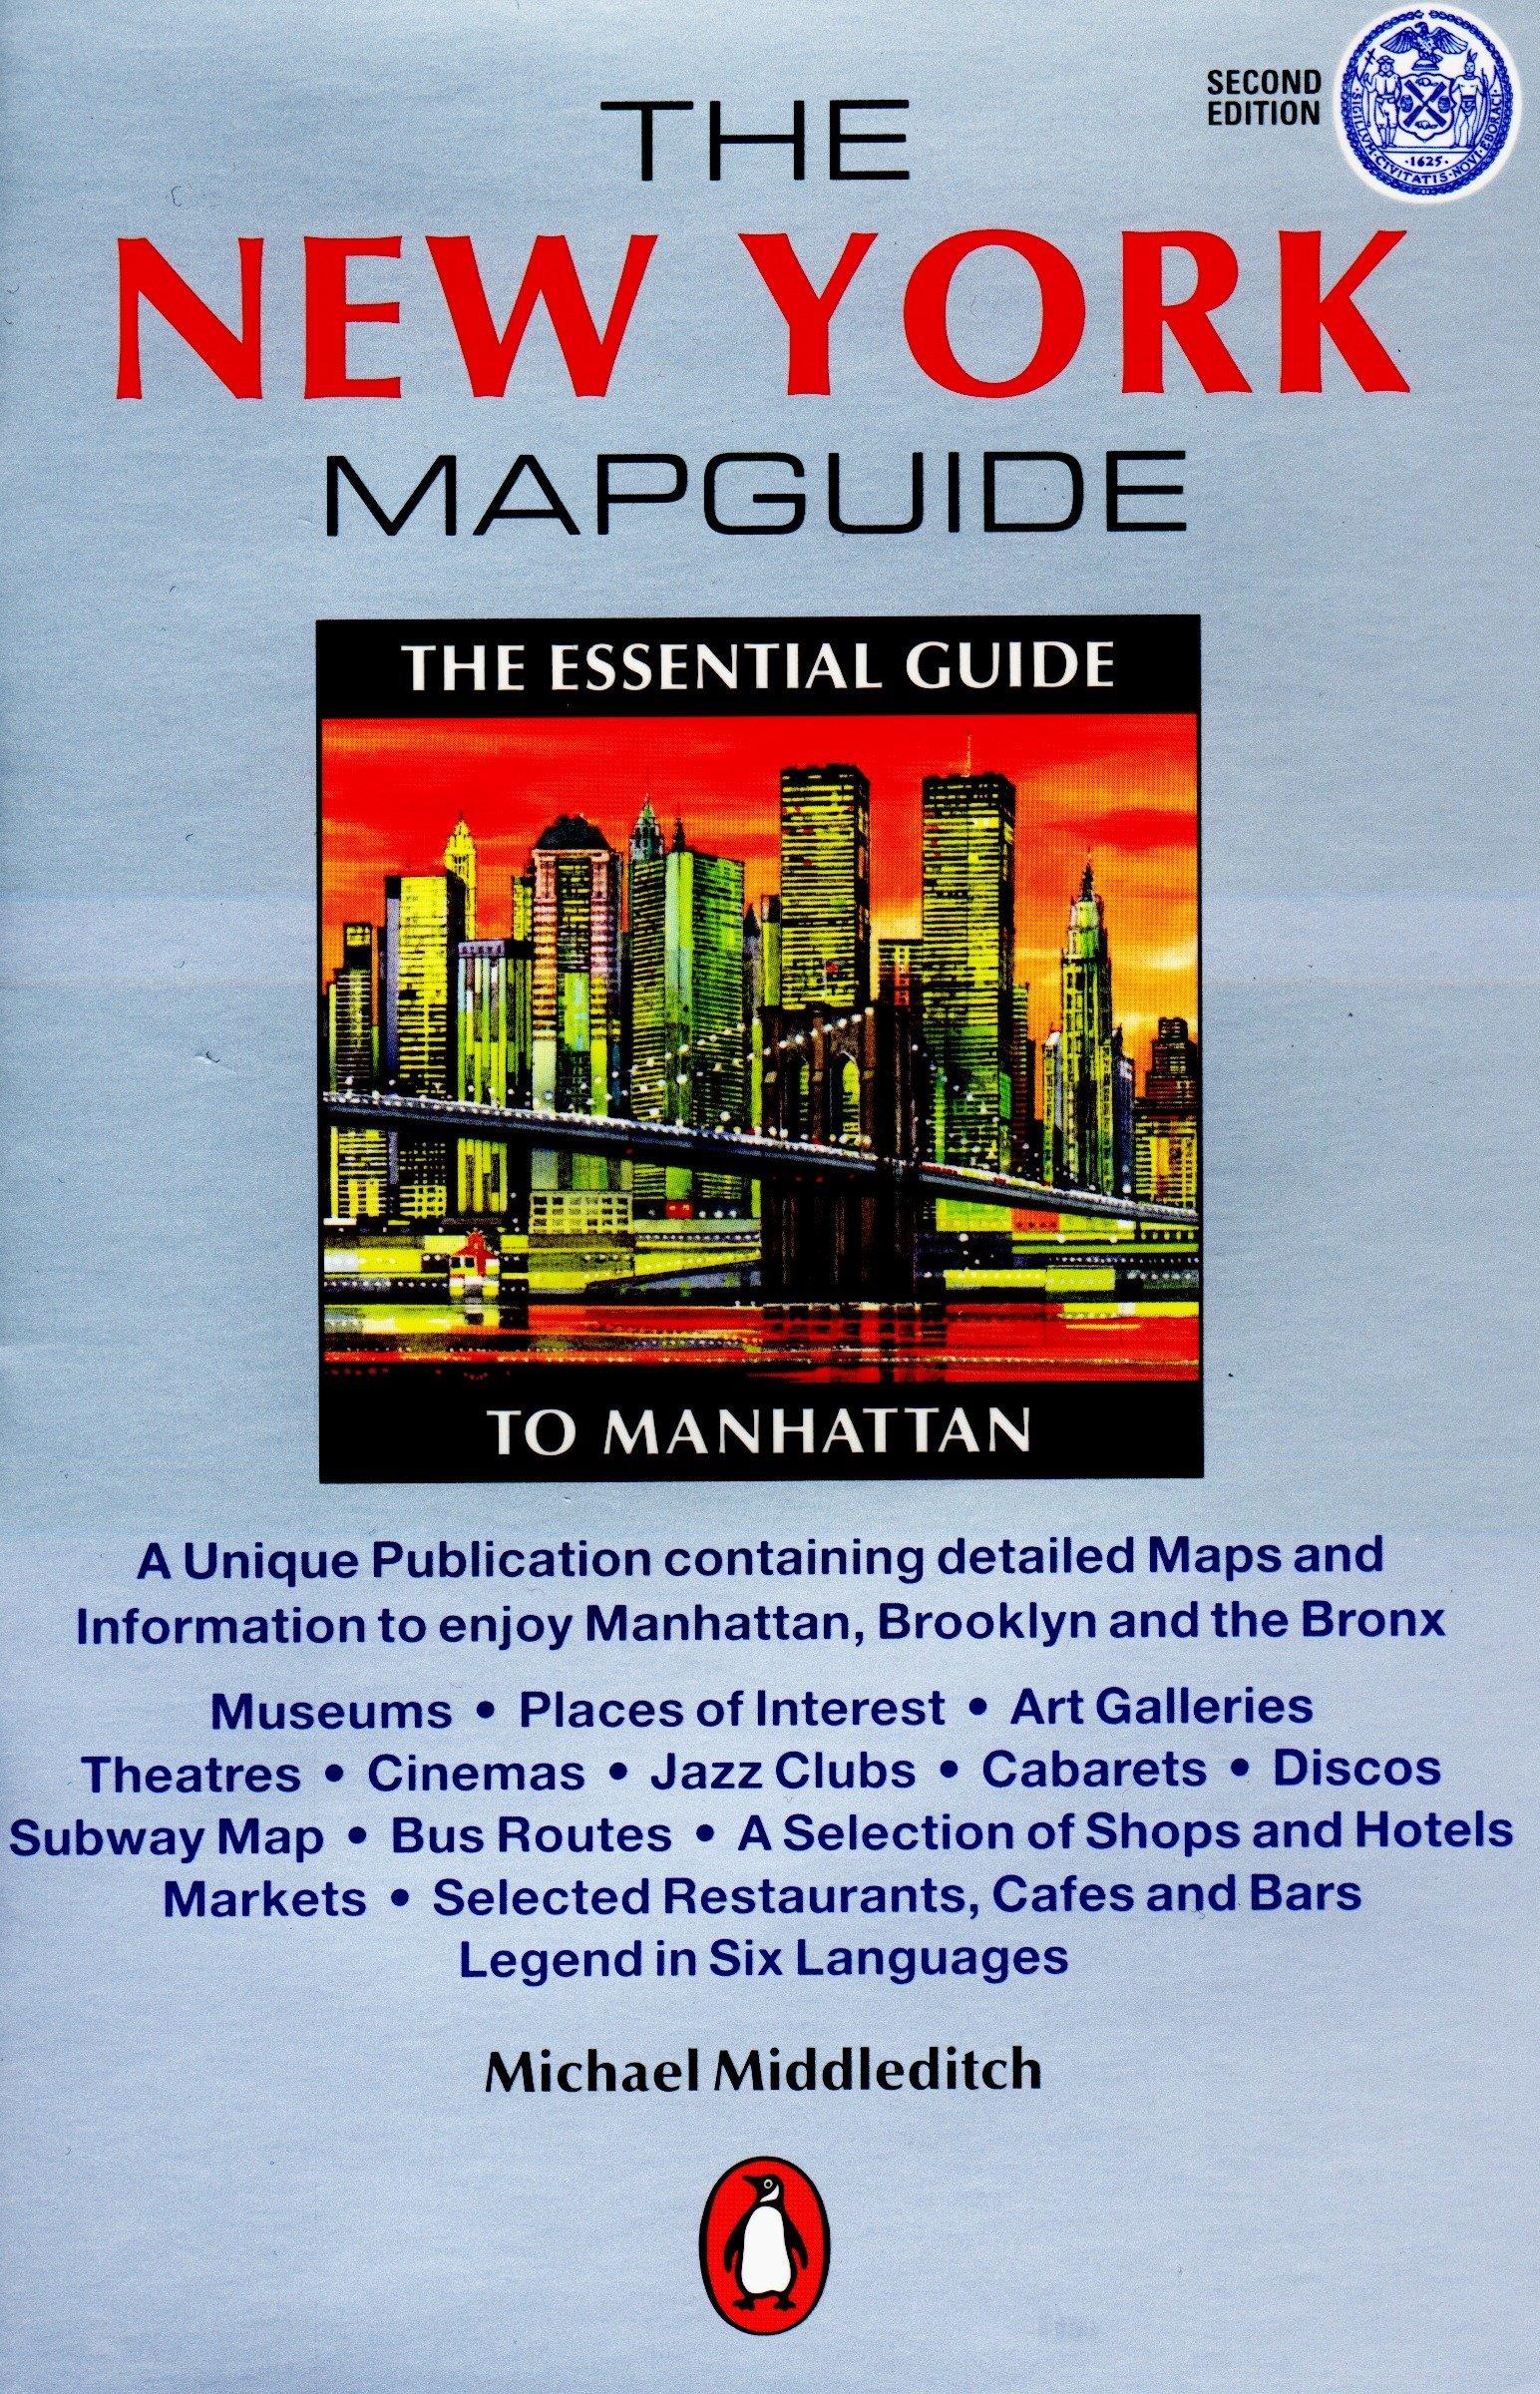 The New York Mapguide: The Essential Guide to Manhattan (Mapguides, Penguin)